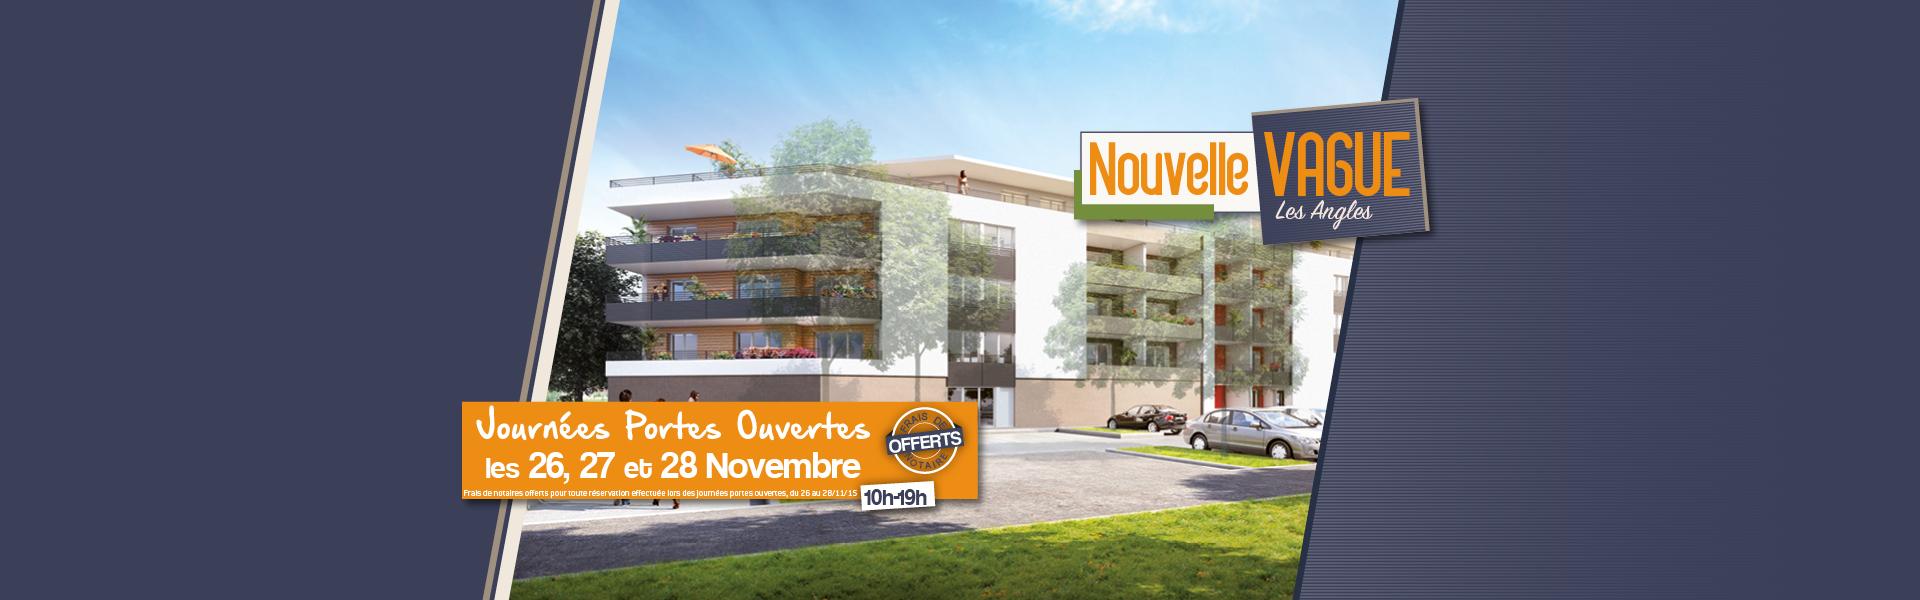 LES ANGLES (30) : Nouvelle r�sidence � 5 min d'Avignon !